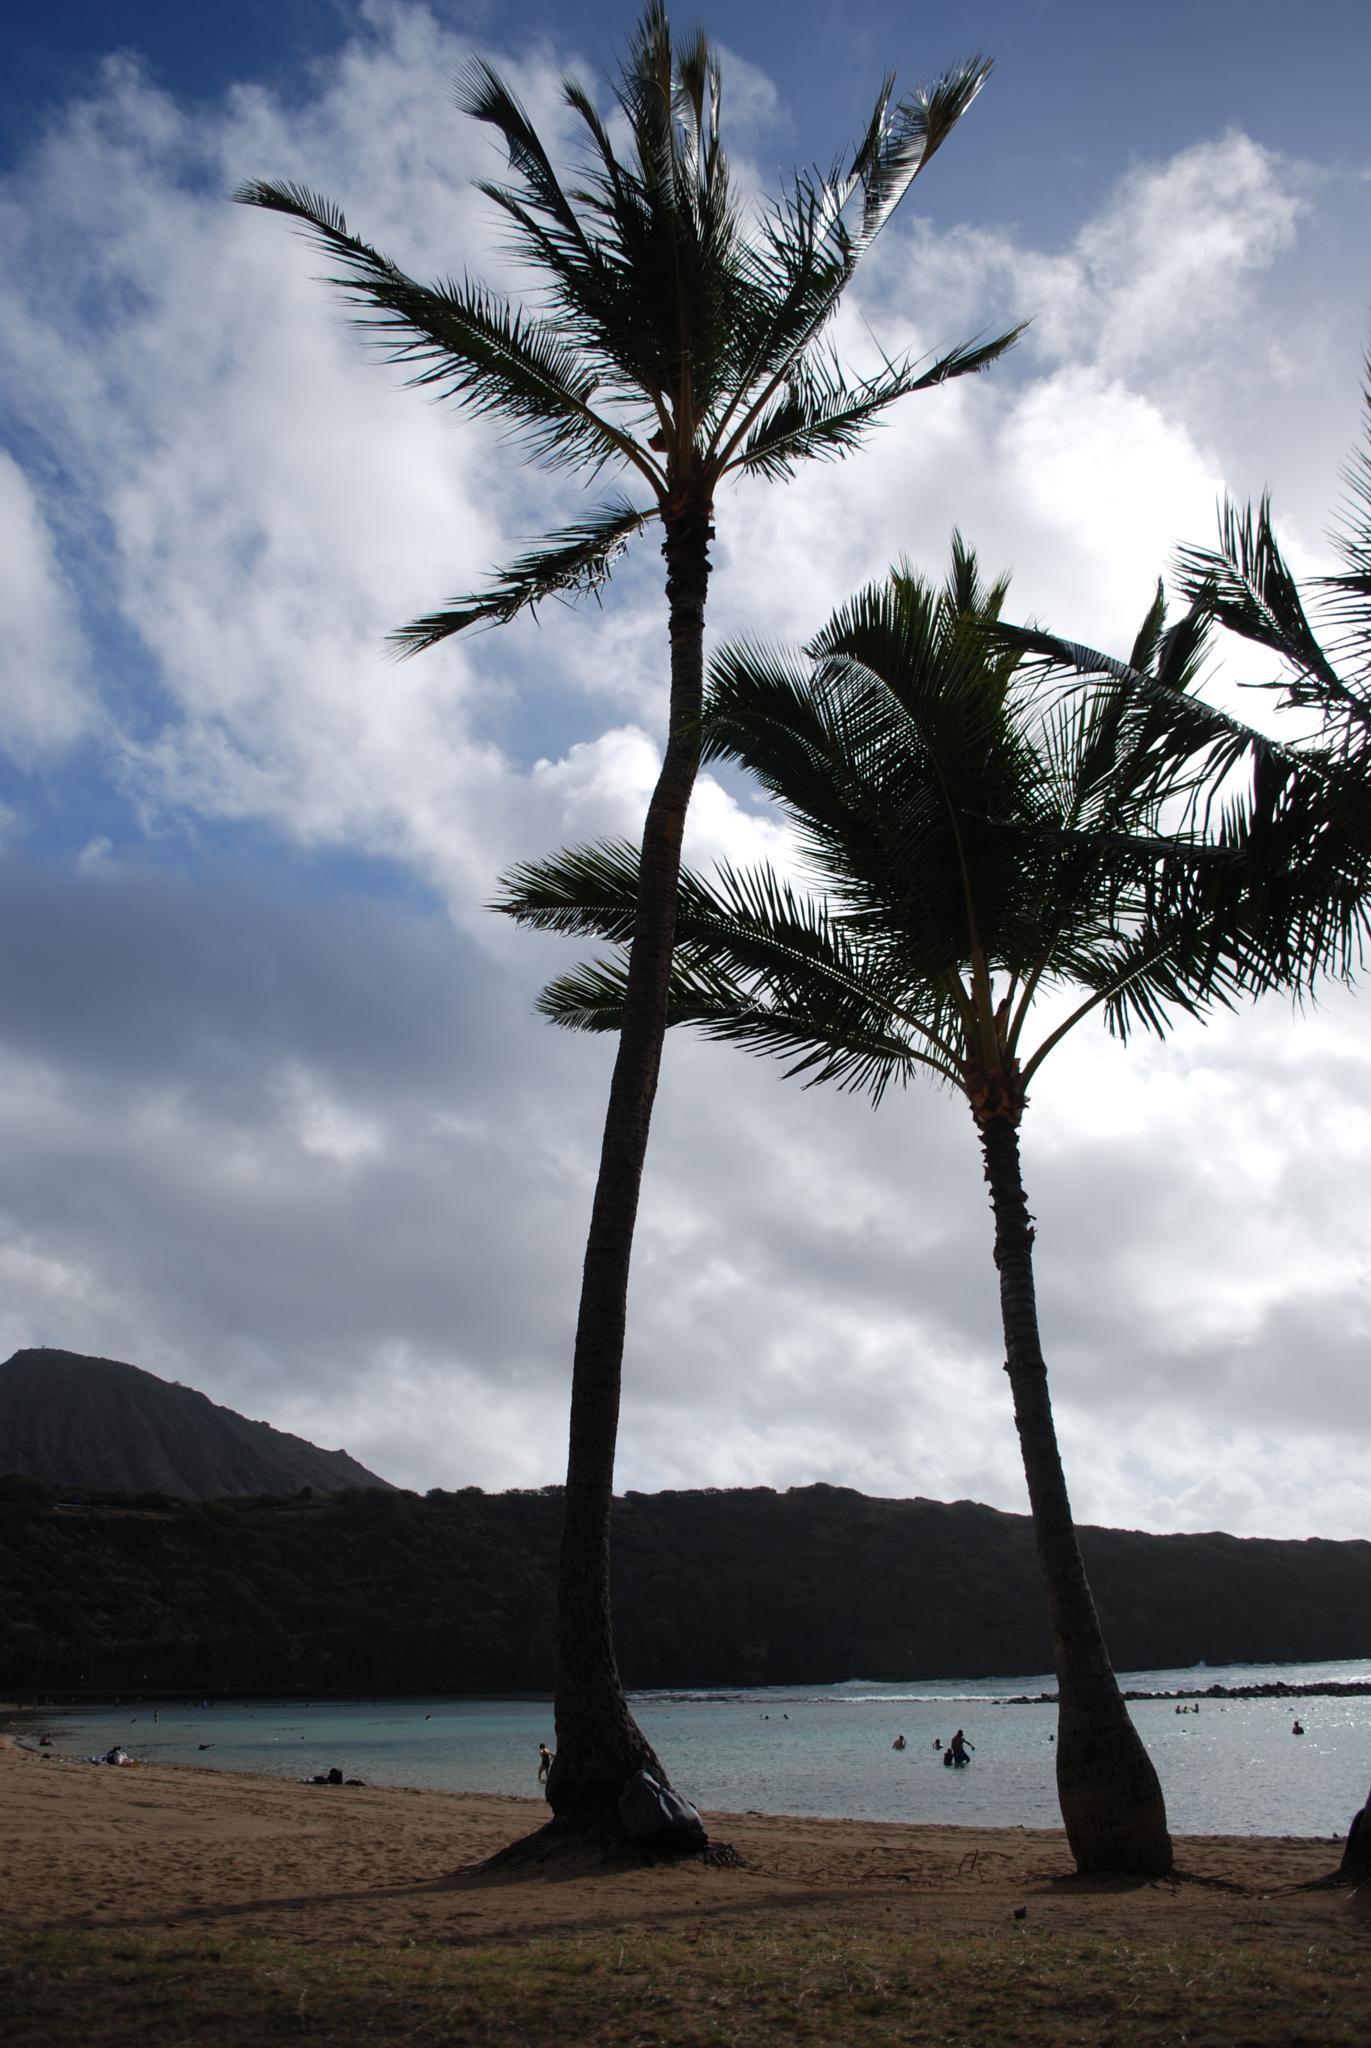 Waikiki Beach, Oahu by kathi.britske